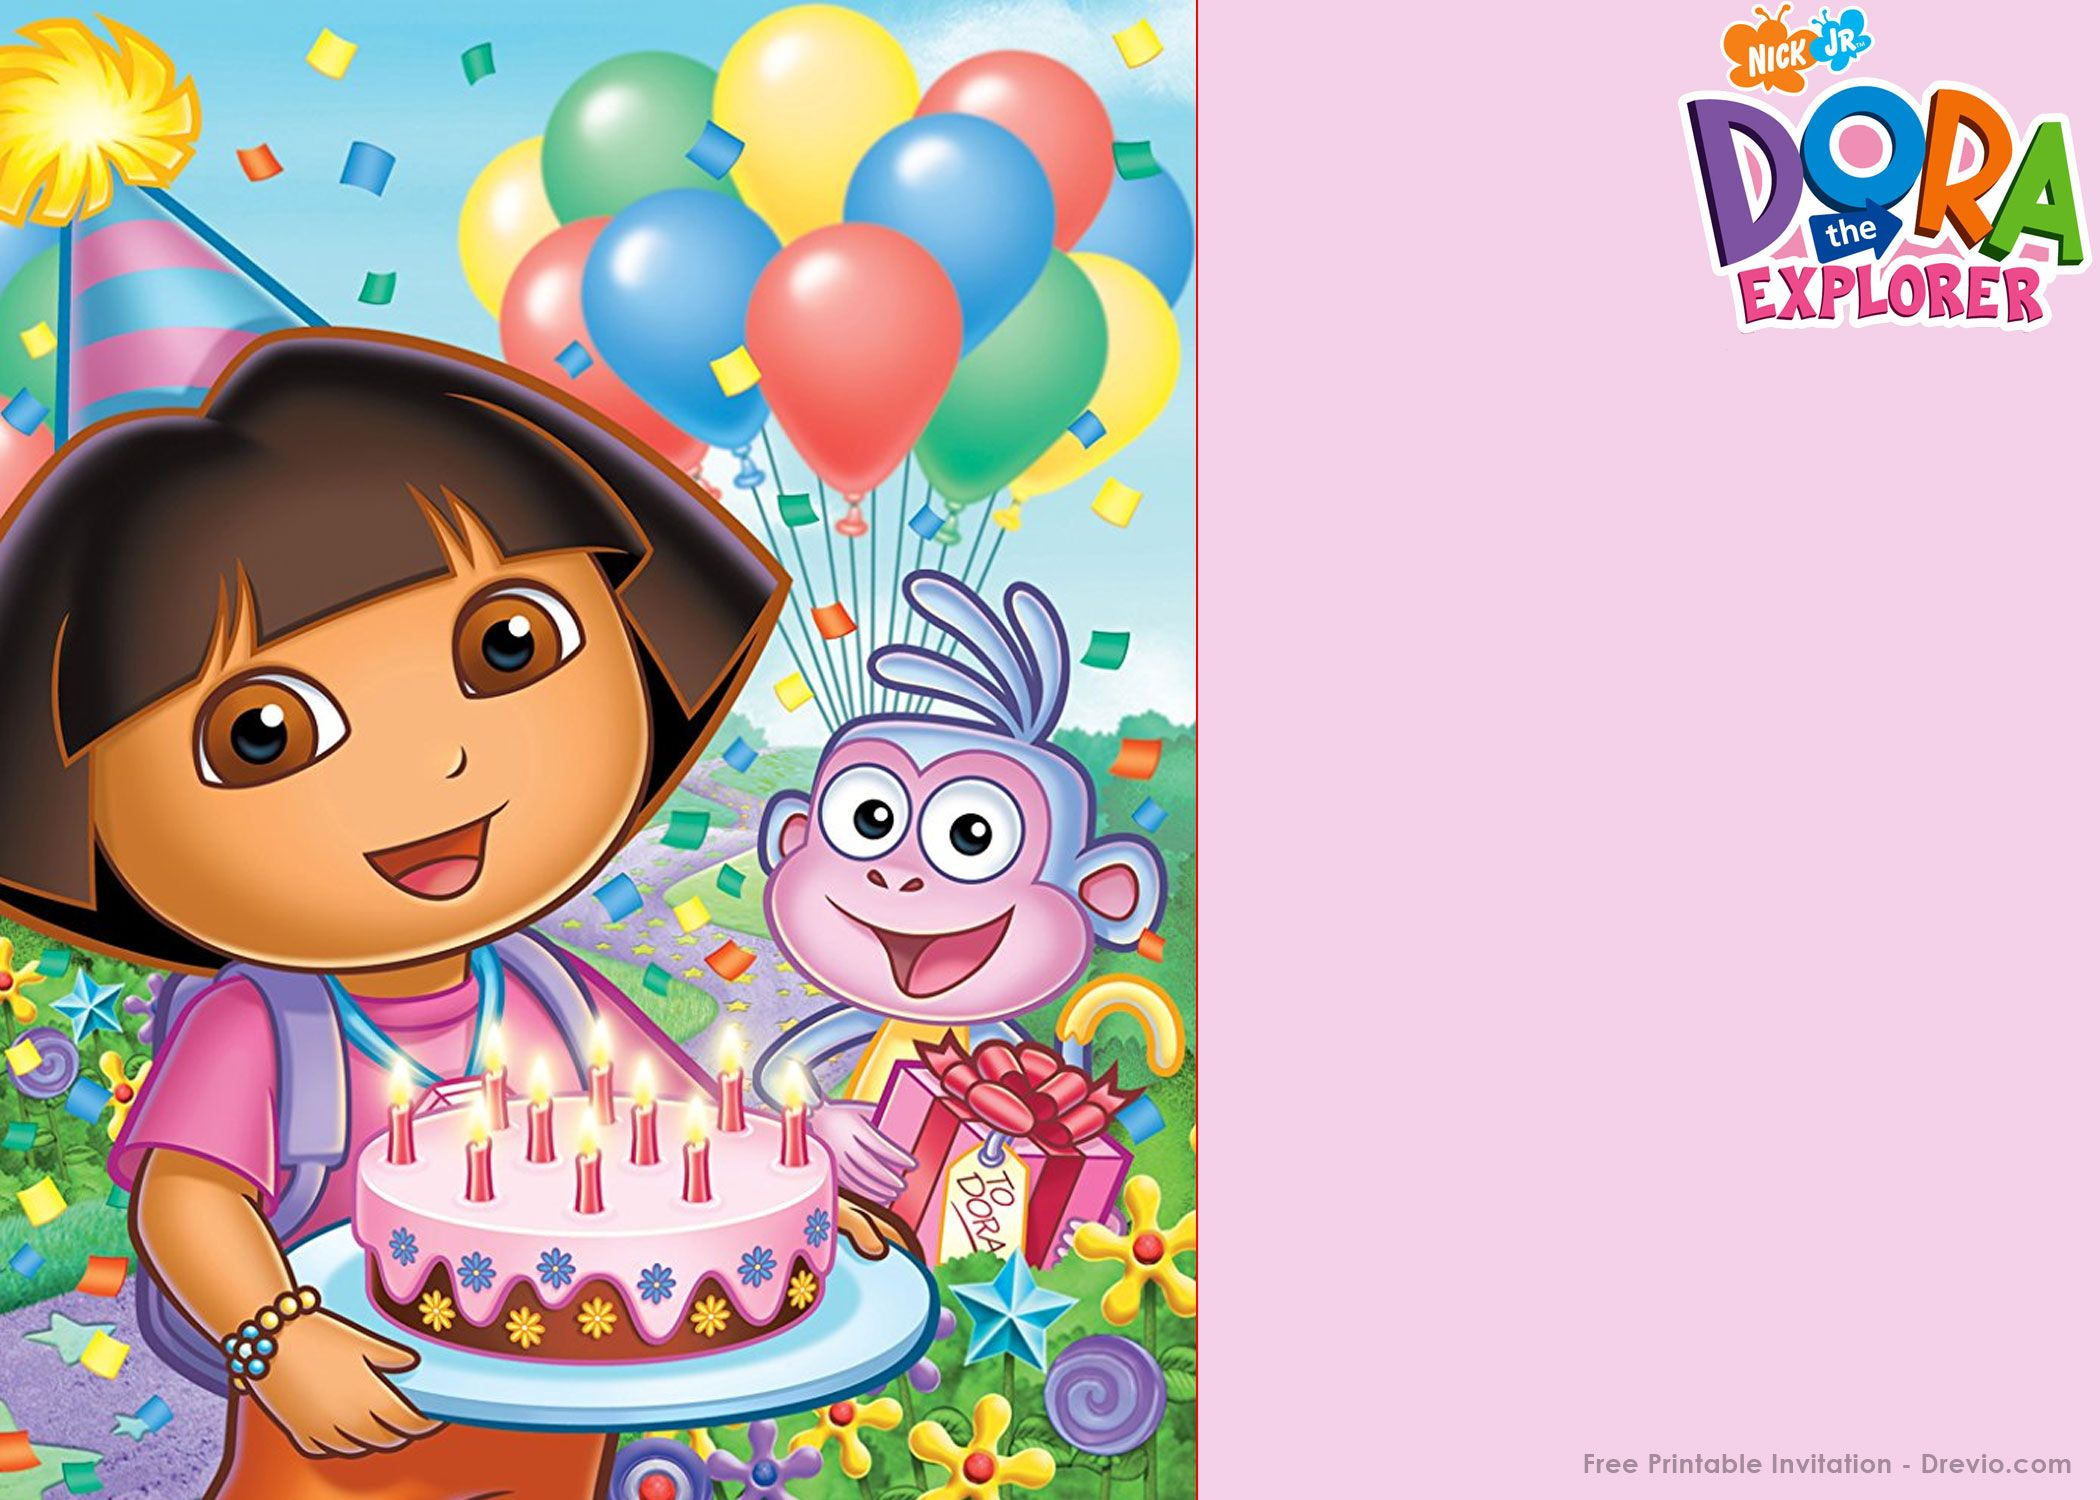 Free Printable Dora The Explorer Party Invitation Template - Dora Birthday Cards Free Printable